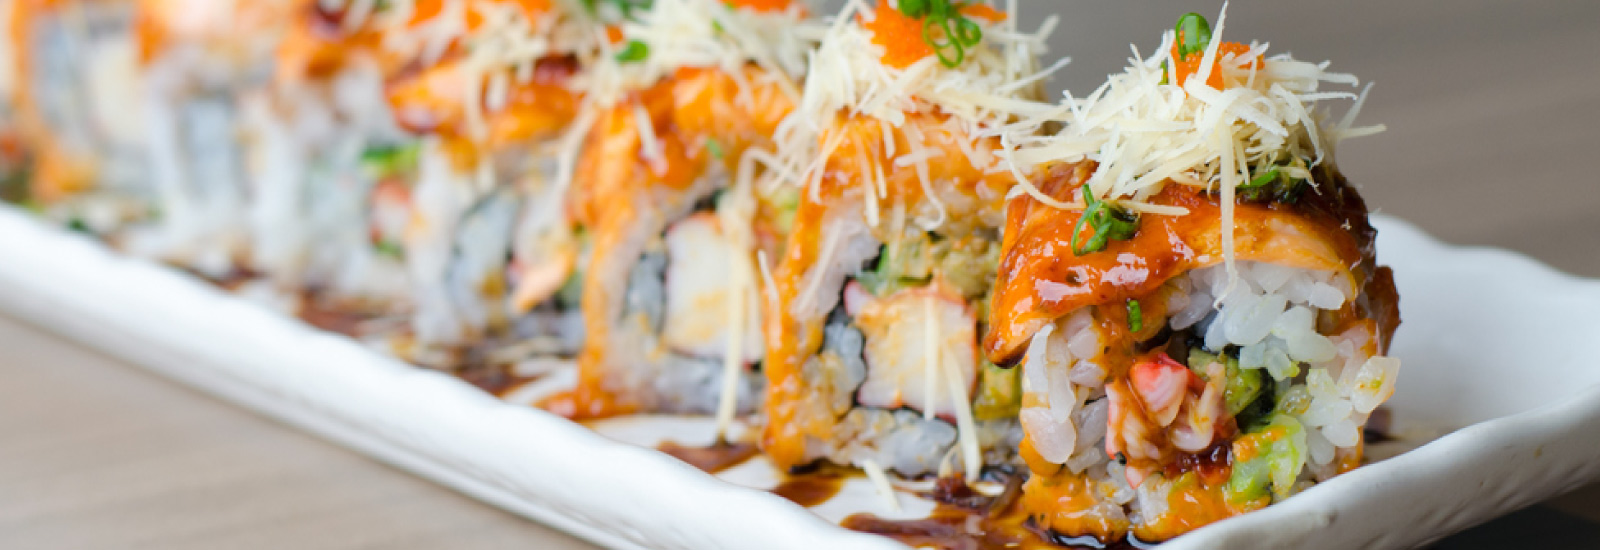 Hissho Sushi, NAS Pensacola, FL